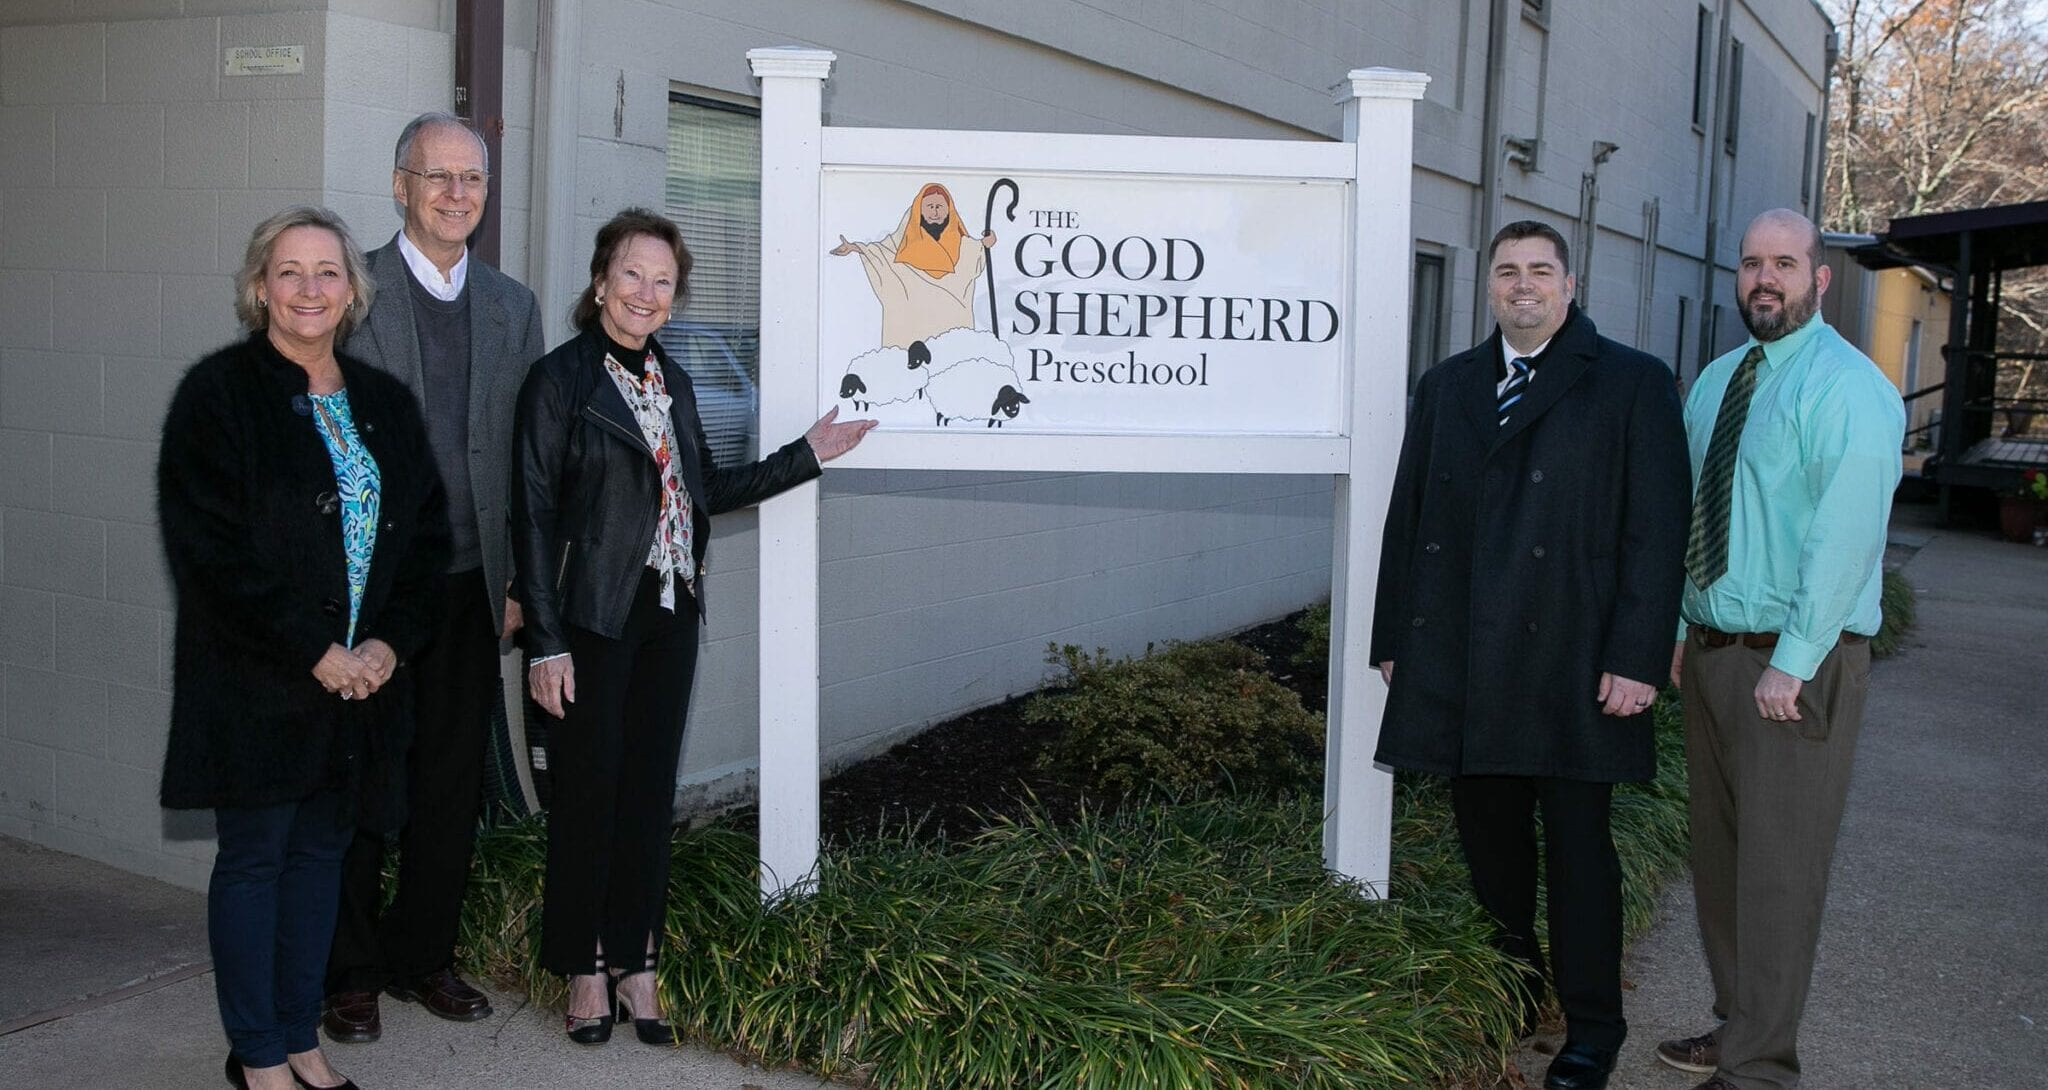 Good_Shepherd_L_026b